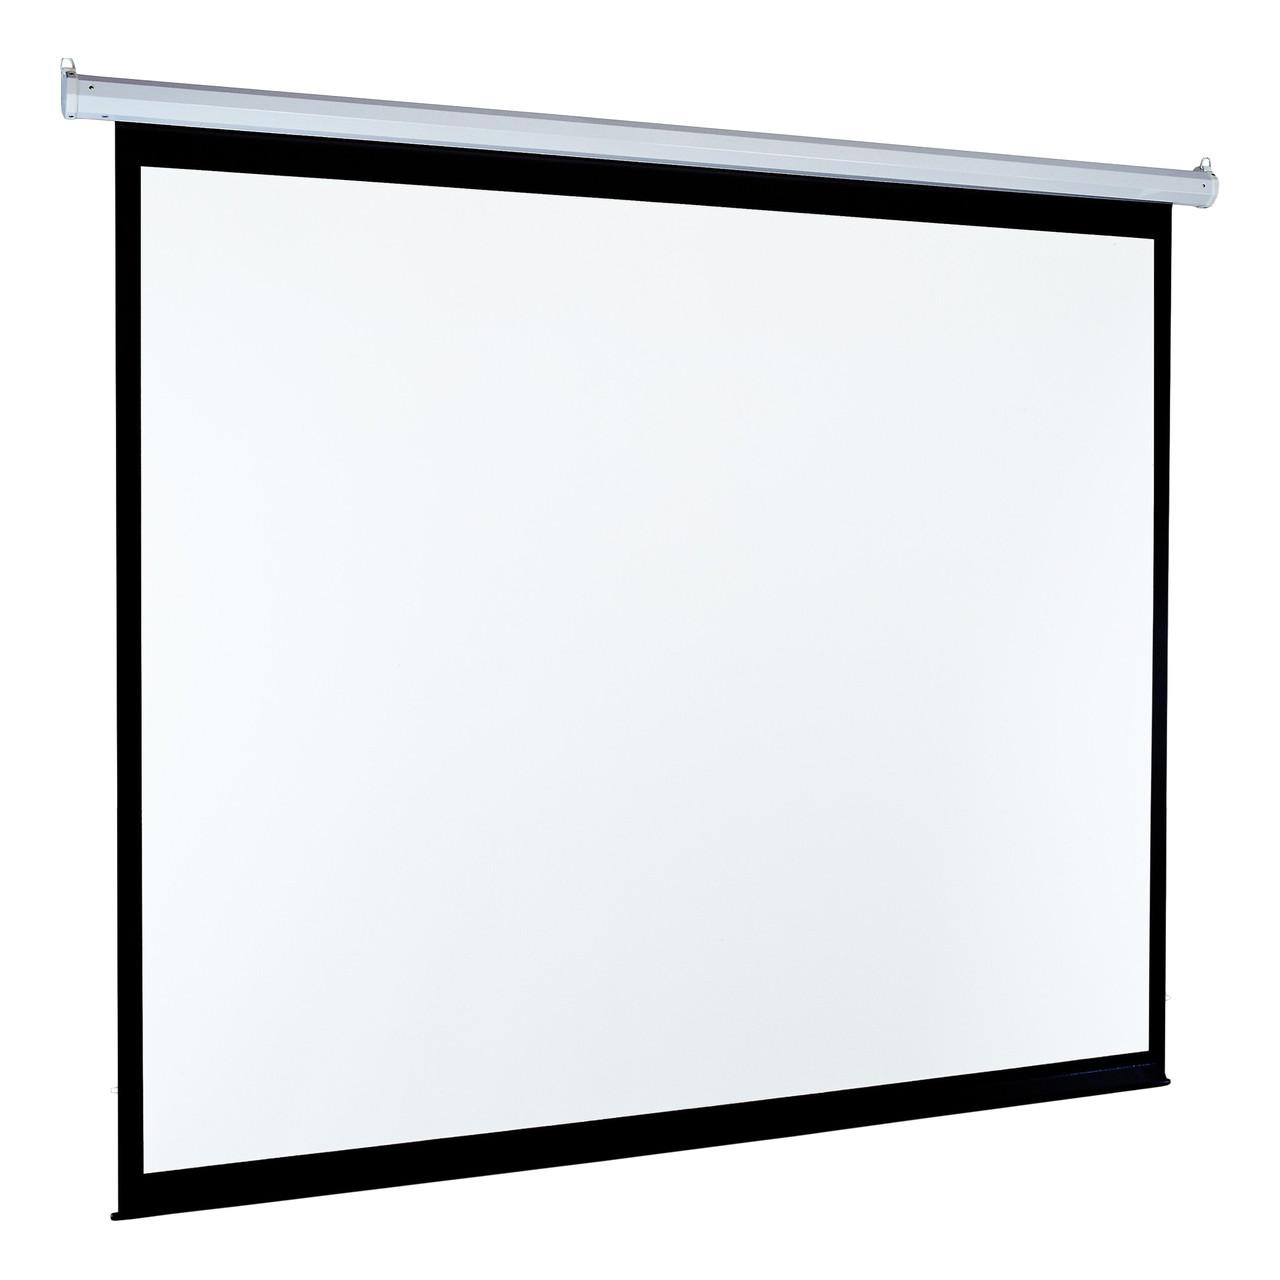 Экран Classic Solution Classic Lyra (1:1) 244x244 (E 236x236/1 MW-L4/W)